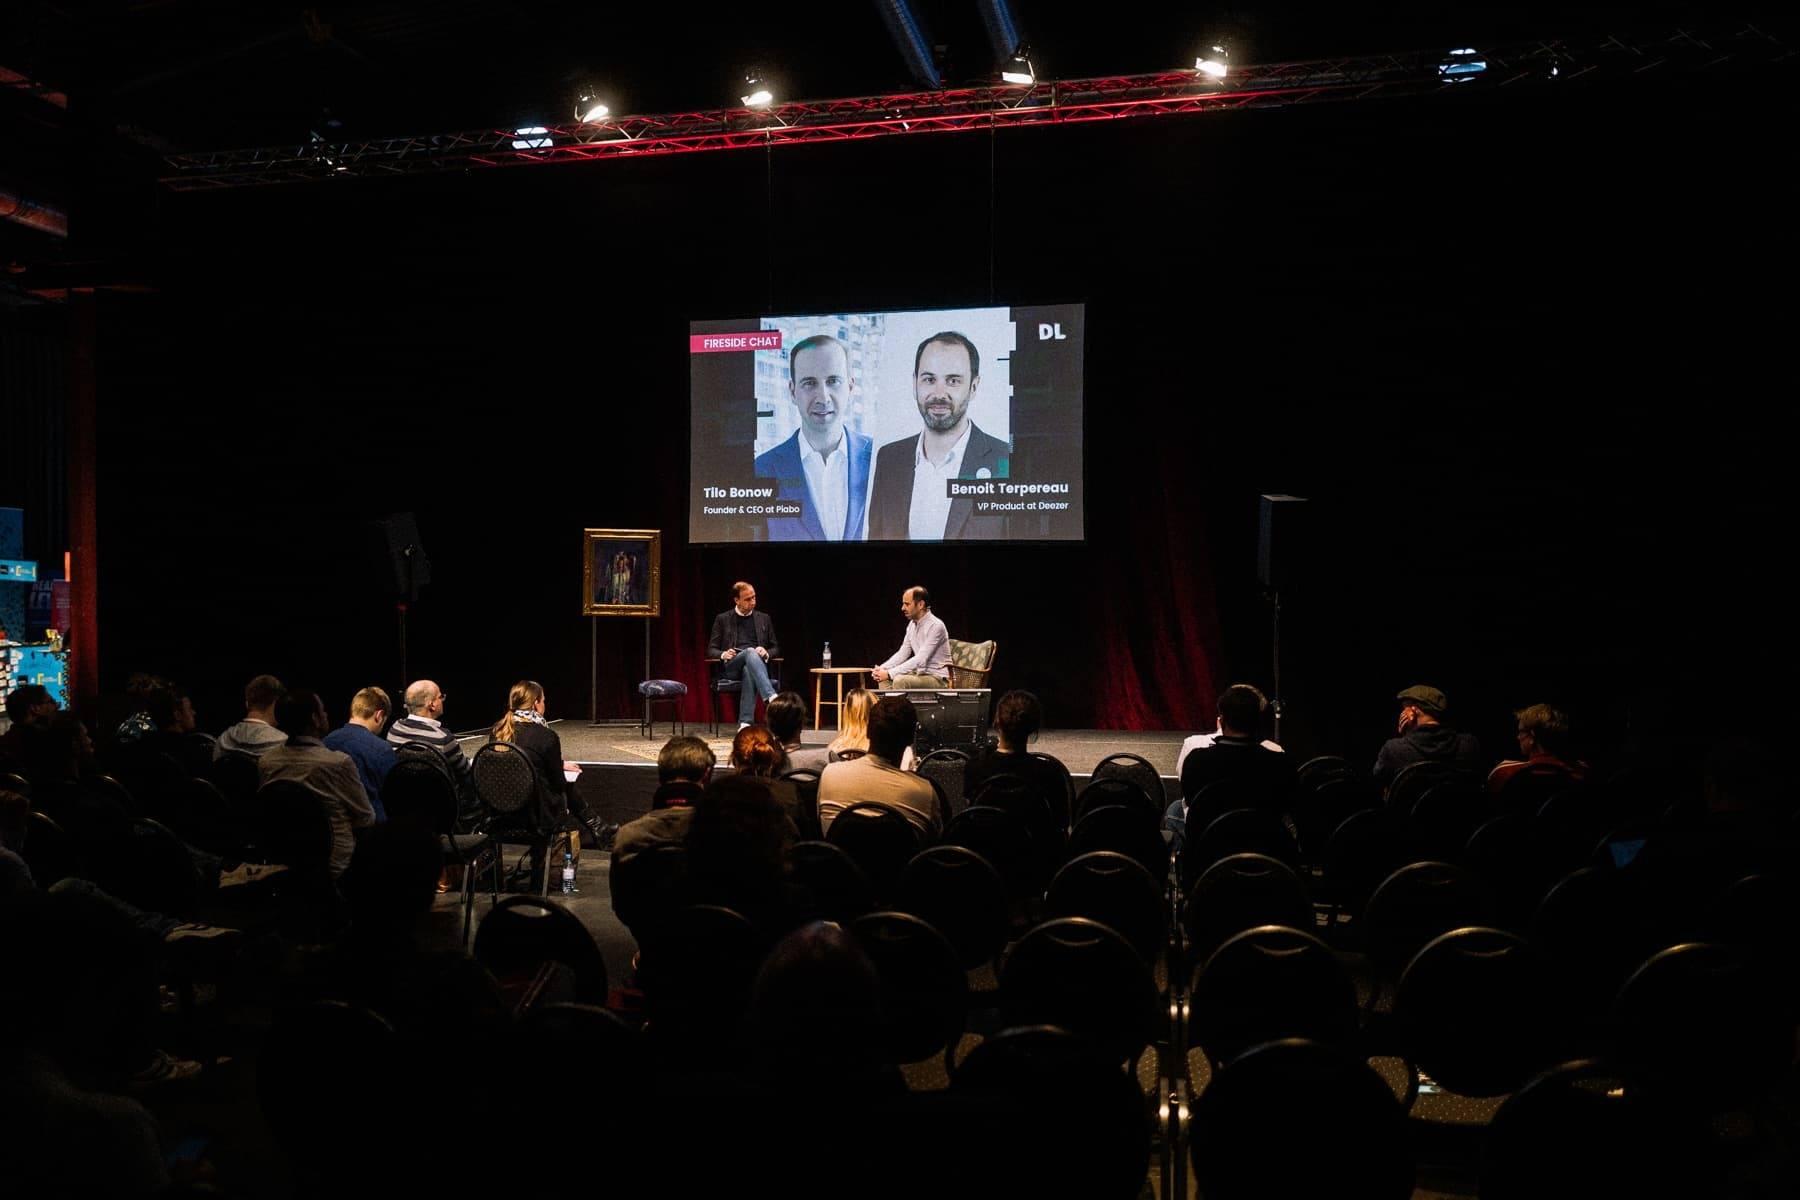 Benoit Terpereau and Tilo Bonow on stage 2 at Digitale Leute Summit 2019.